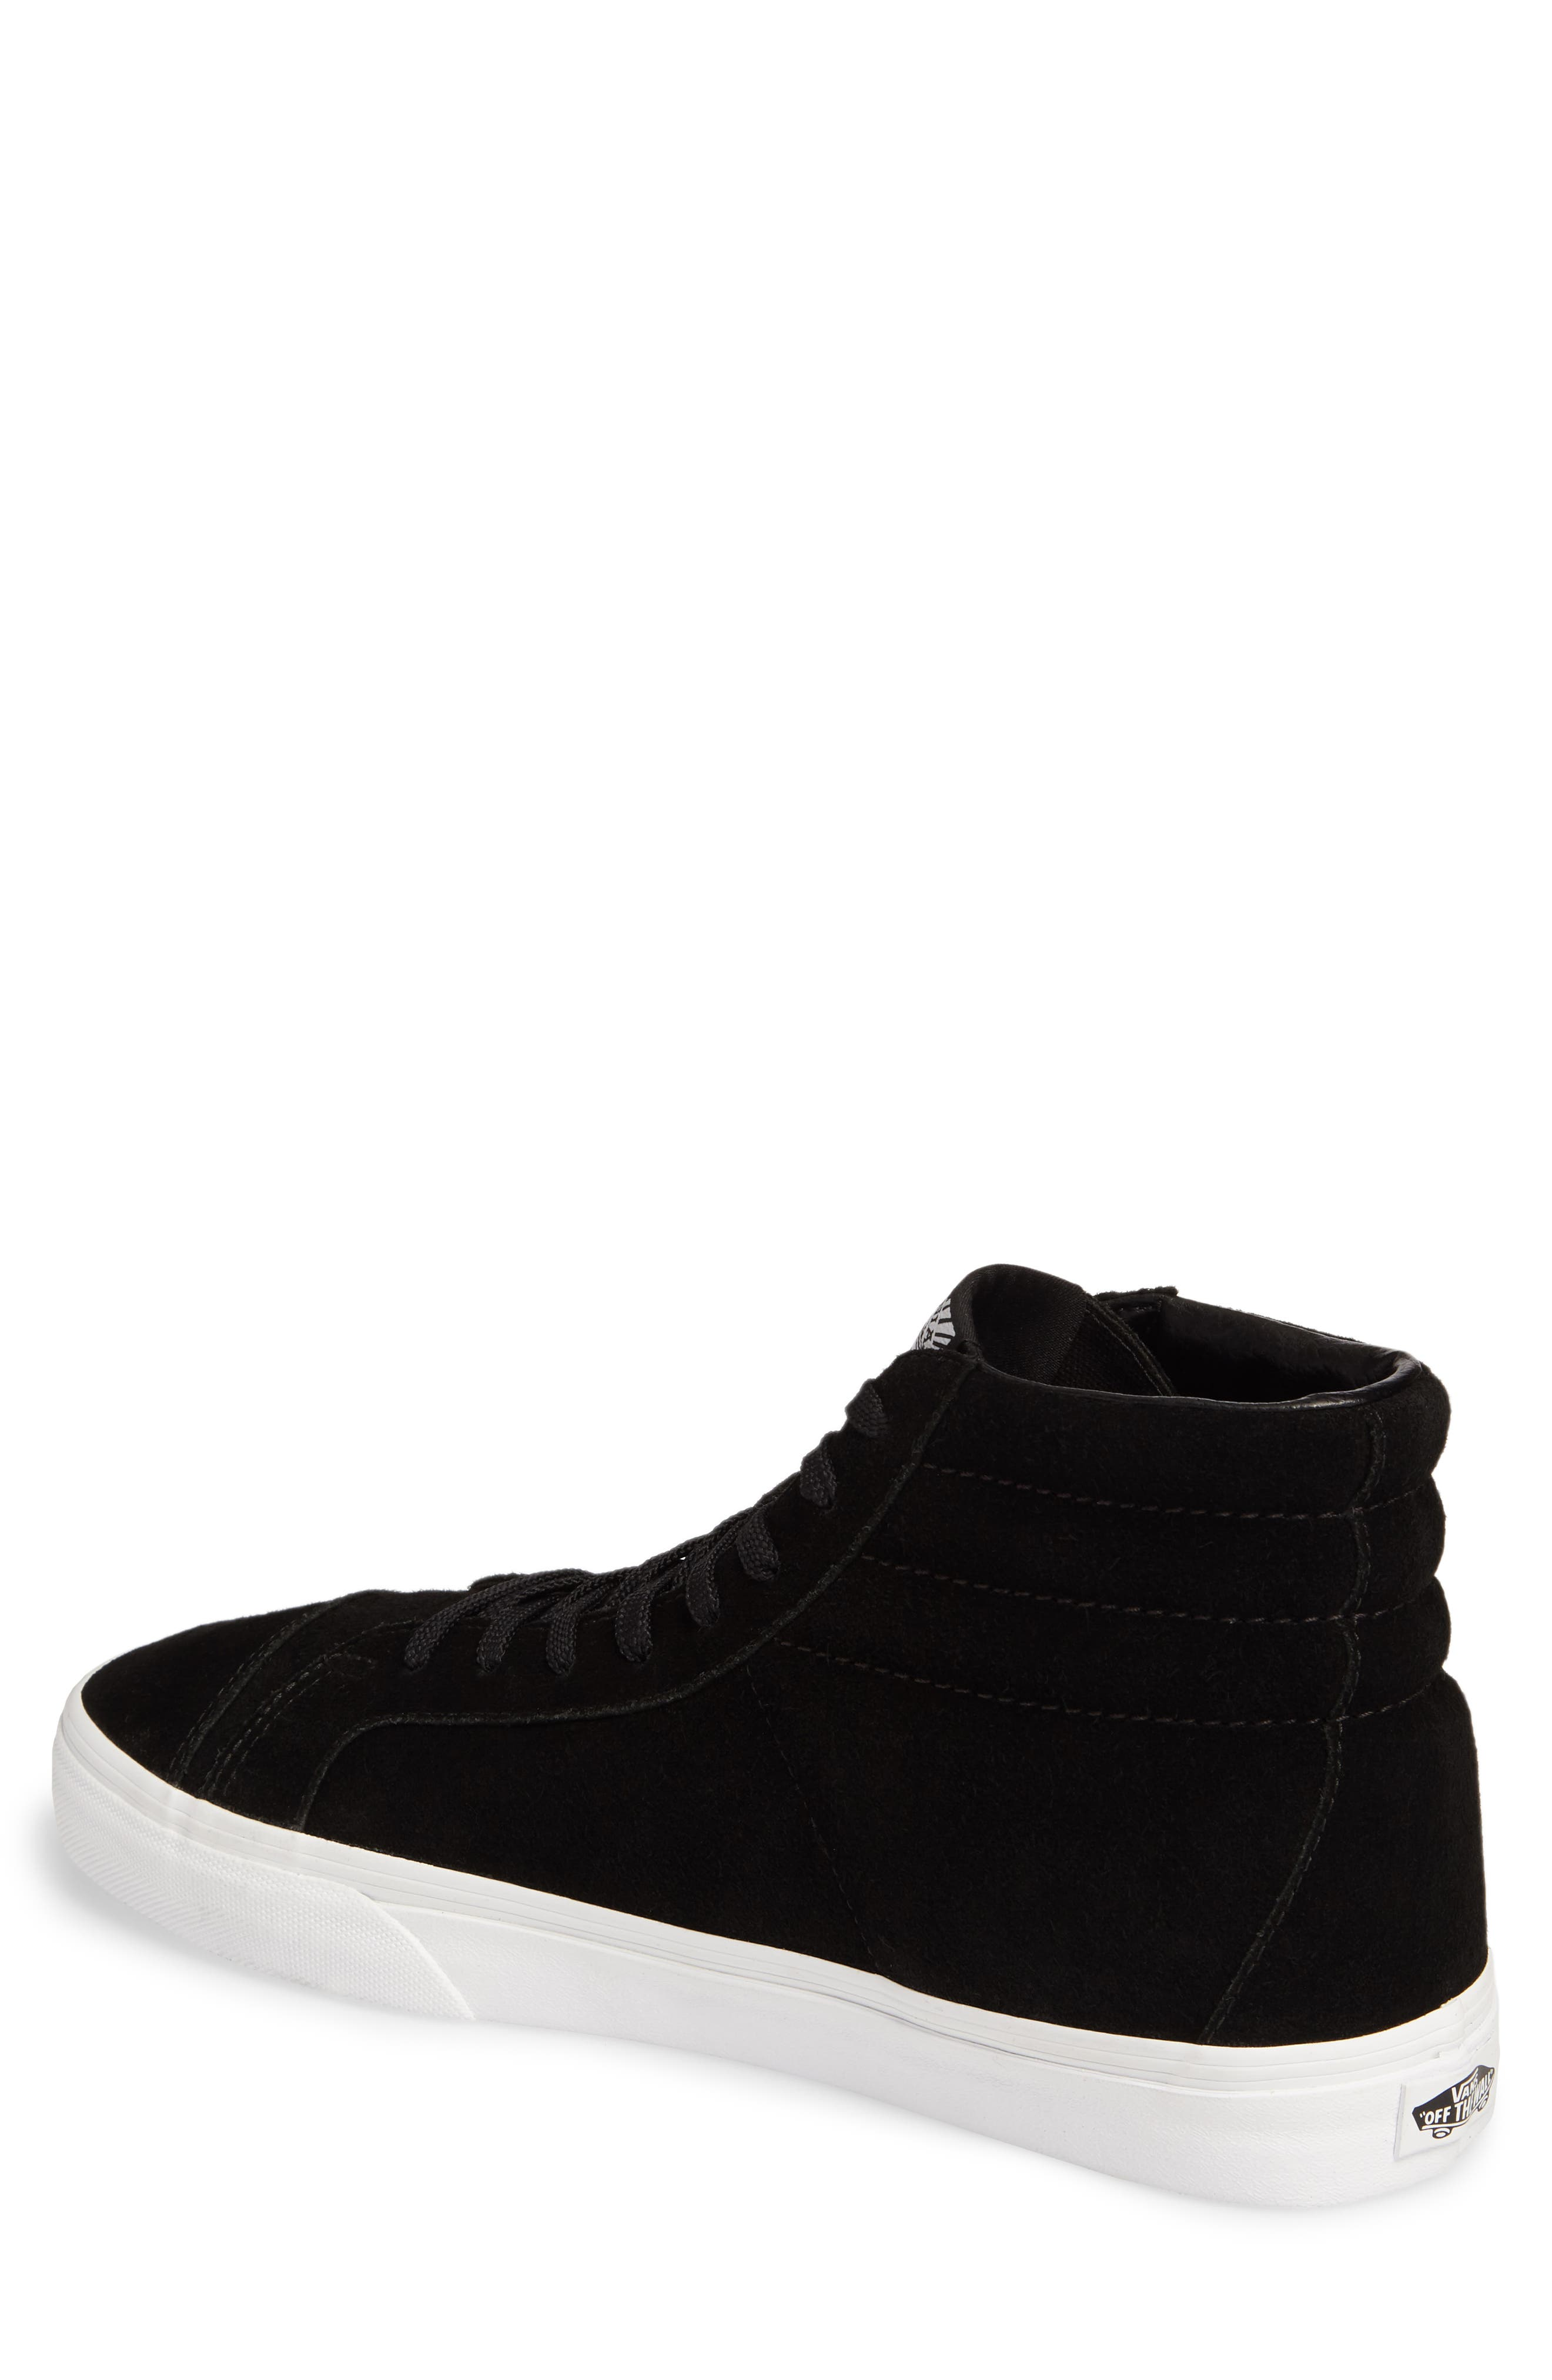 Style 238 Sneaker,                             Alternate thumbnail 2, color,                             001